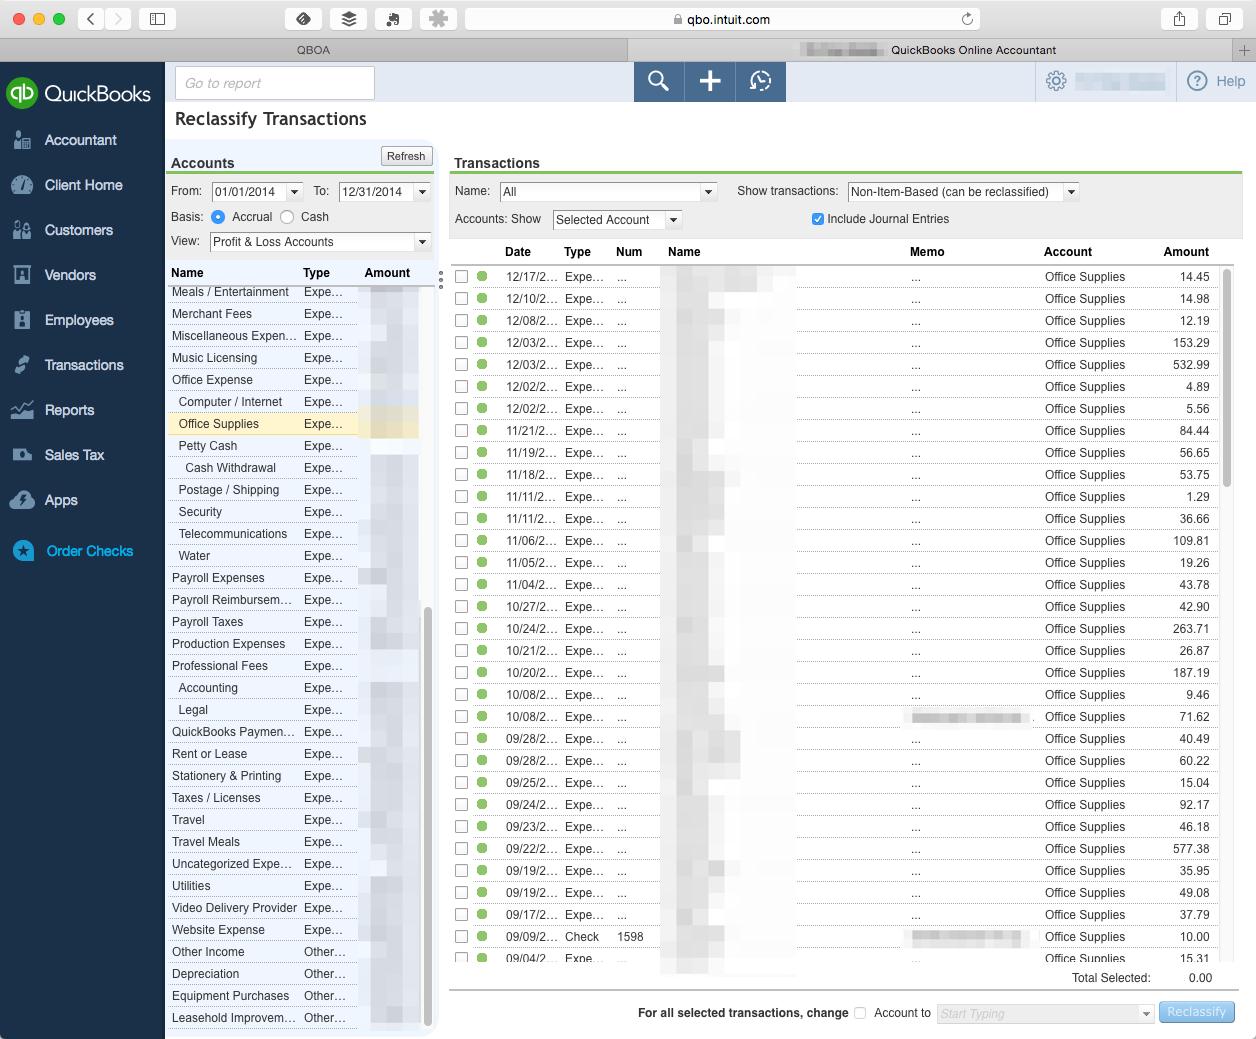 QuickBooks Online's   Reclassify Transactionsscreen